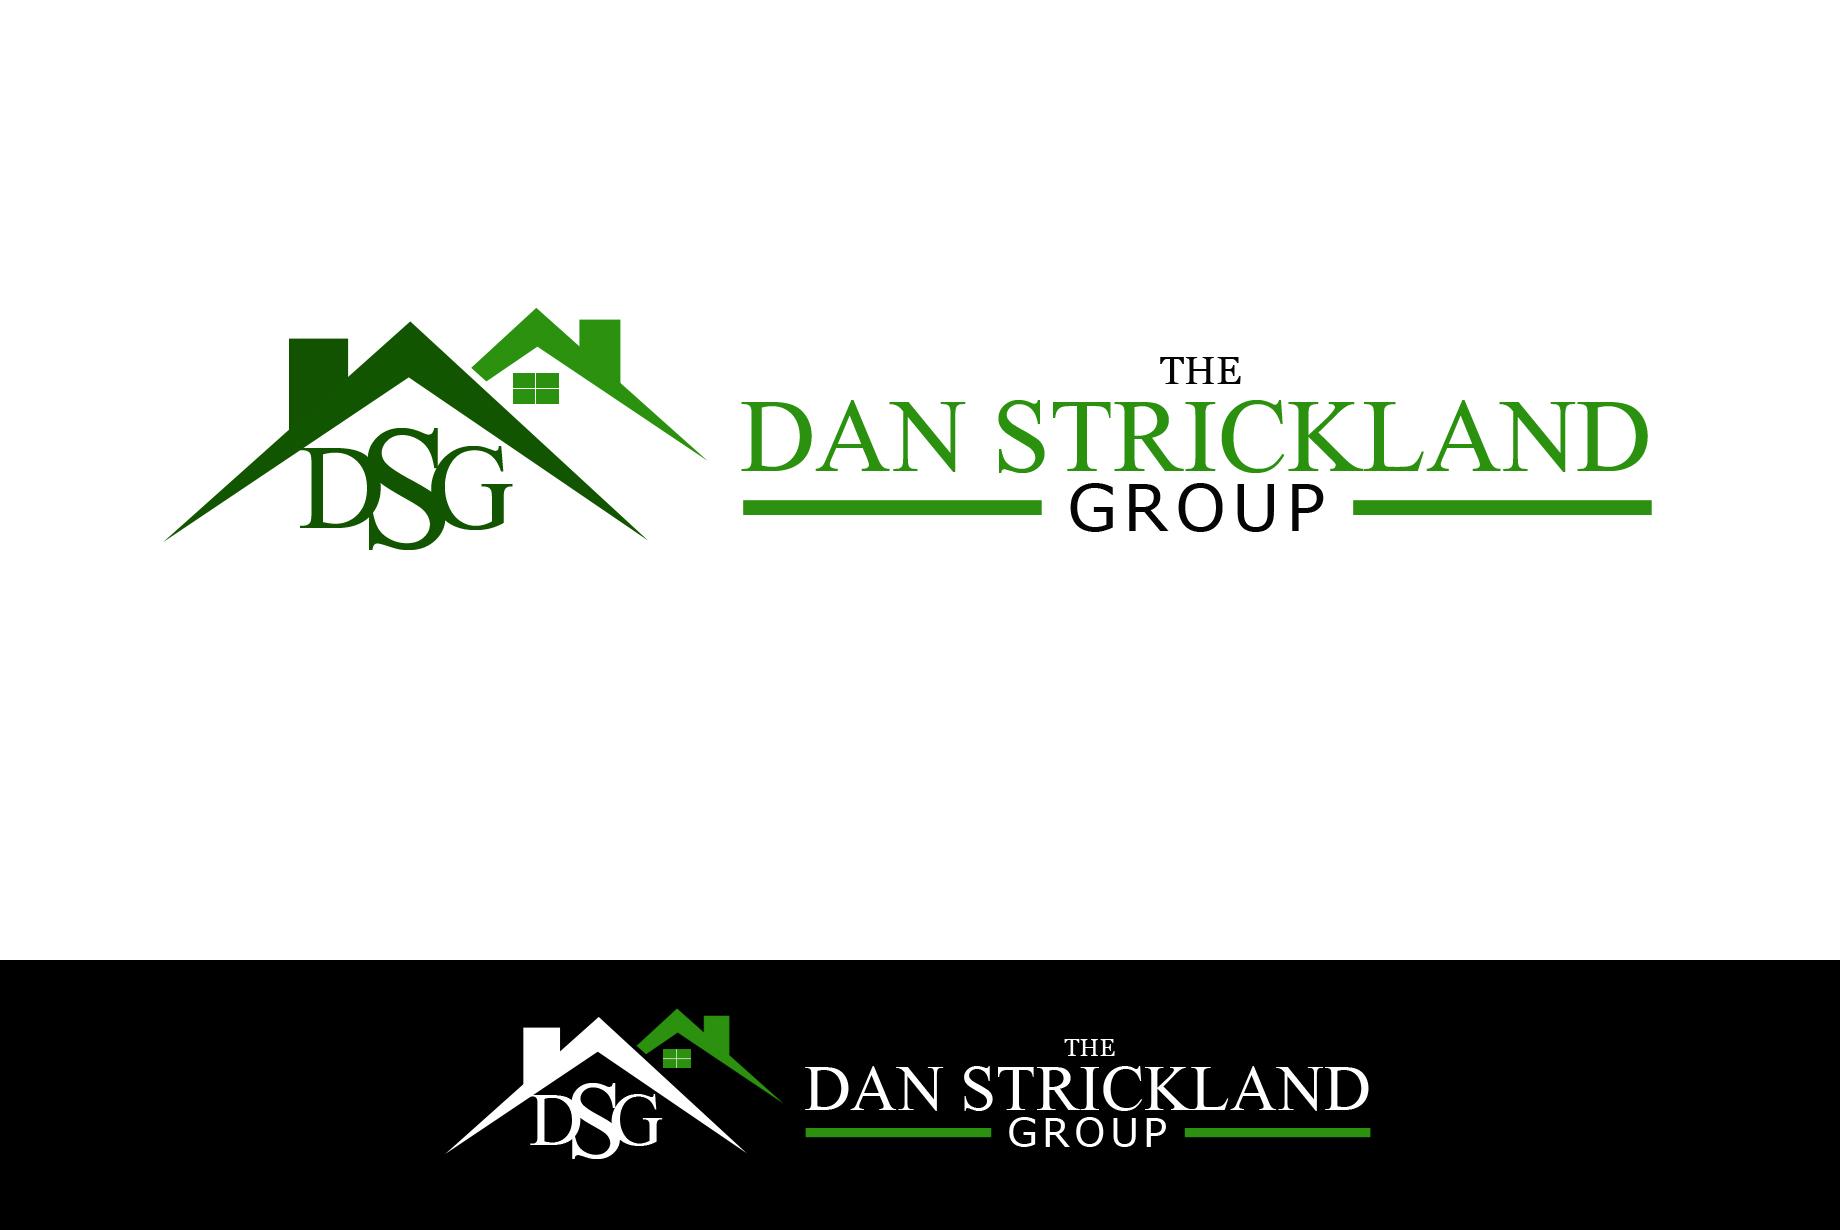 Logo Design by Jan Chua - Entry No. 135 in the Logo Design Contest Creative Logo Design for The Dan Strickland Group.